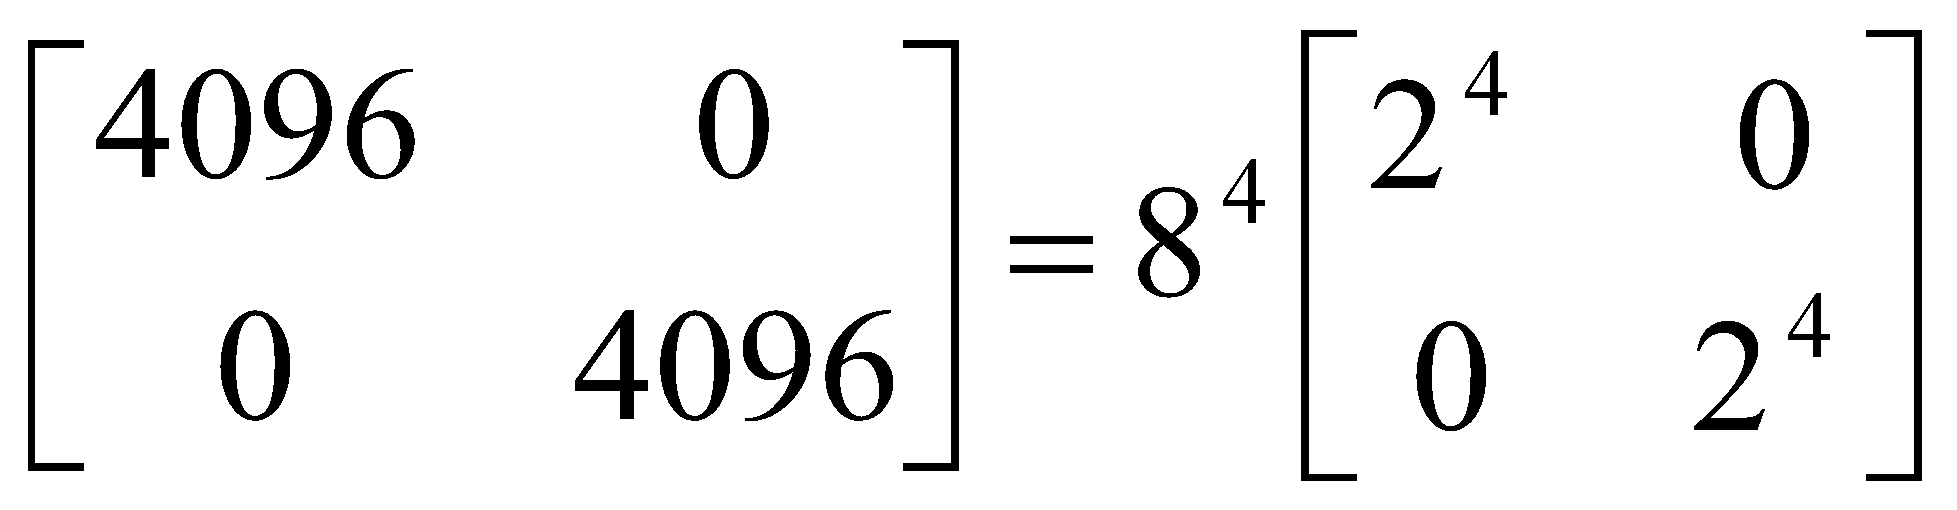 image94.png